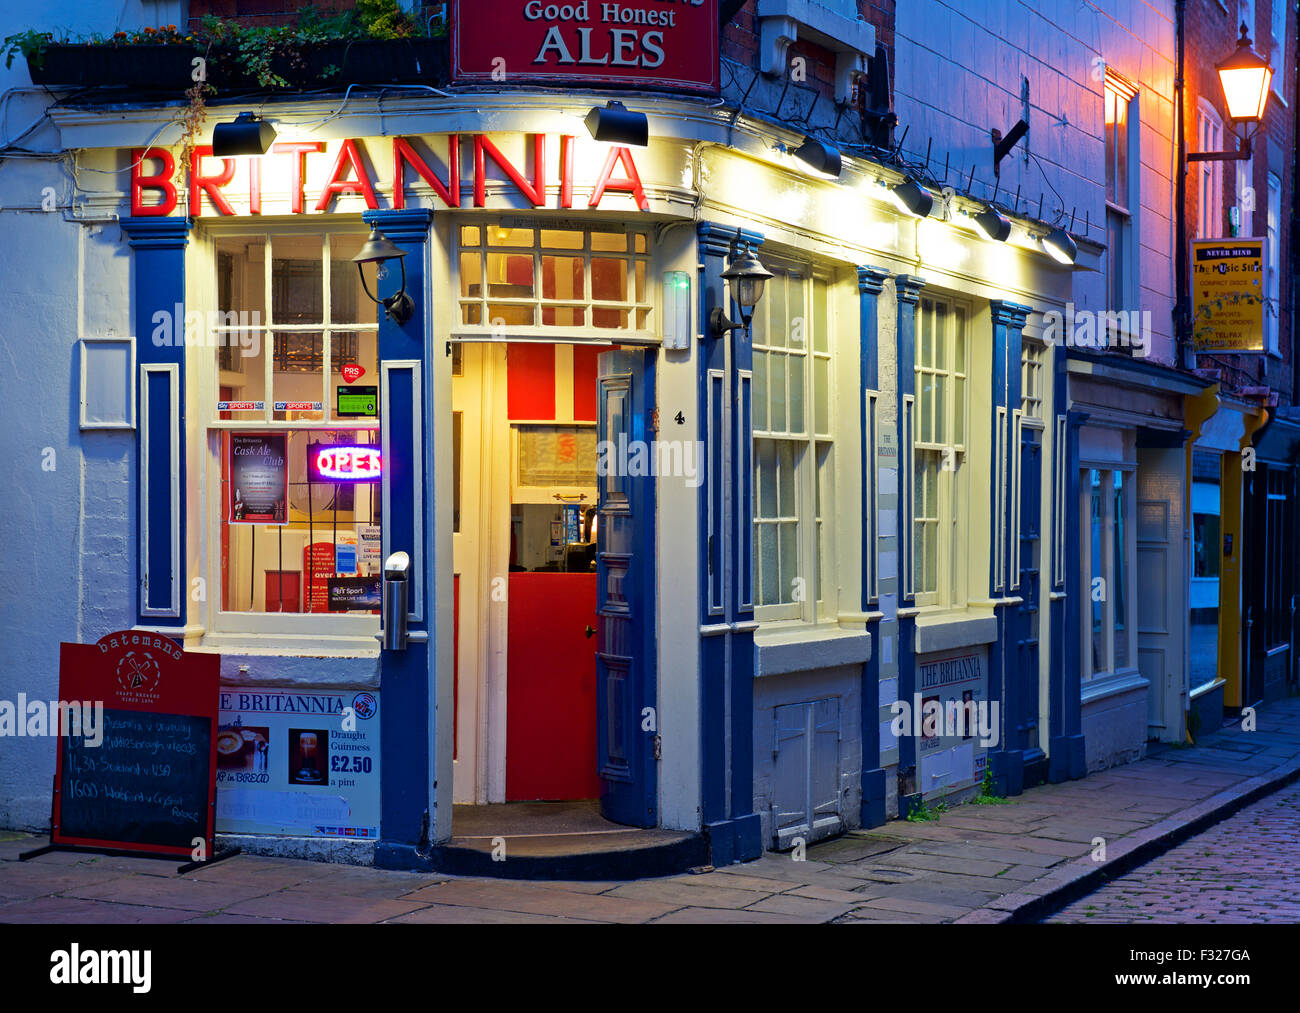 The Britannia pub at twilight, Boston, Lincolnshire, England UK Stock Photo